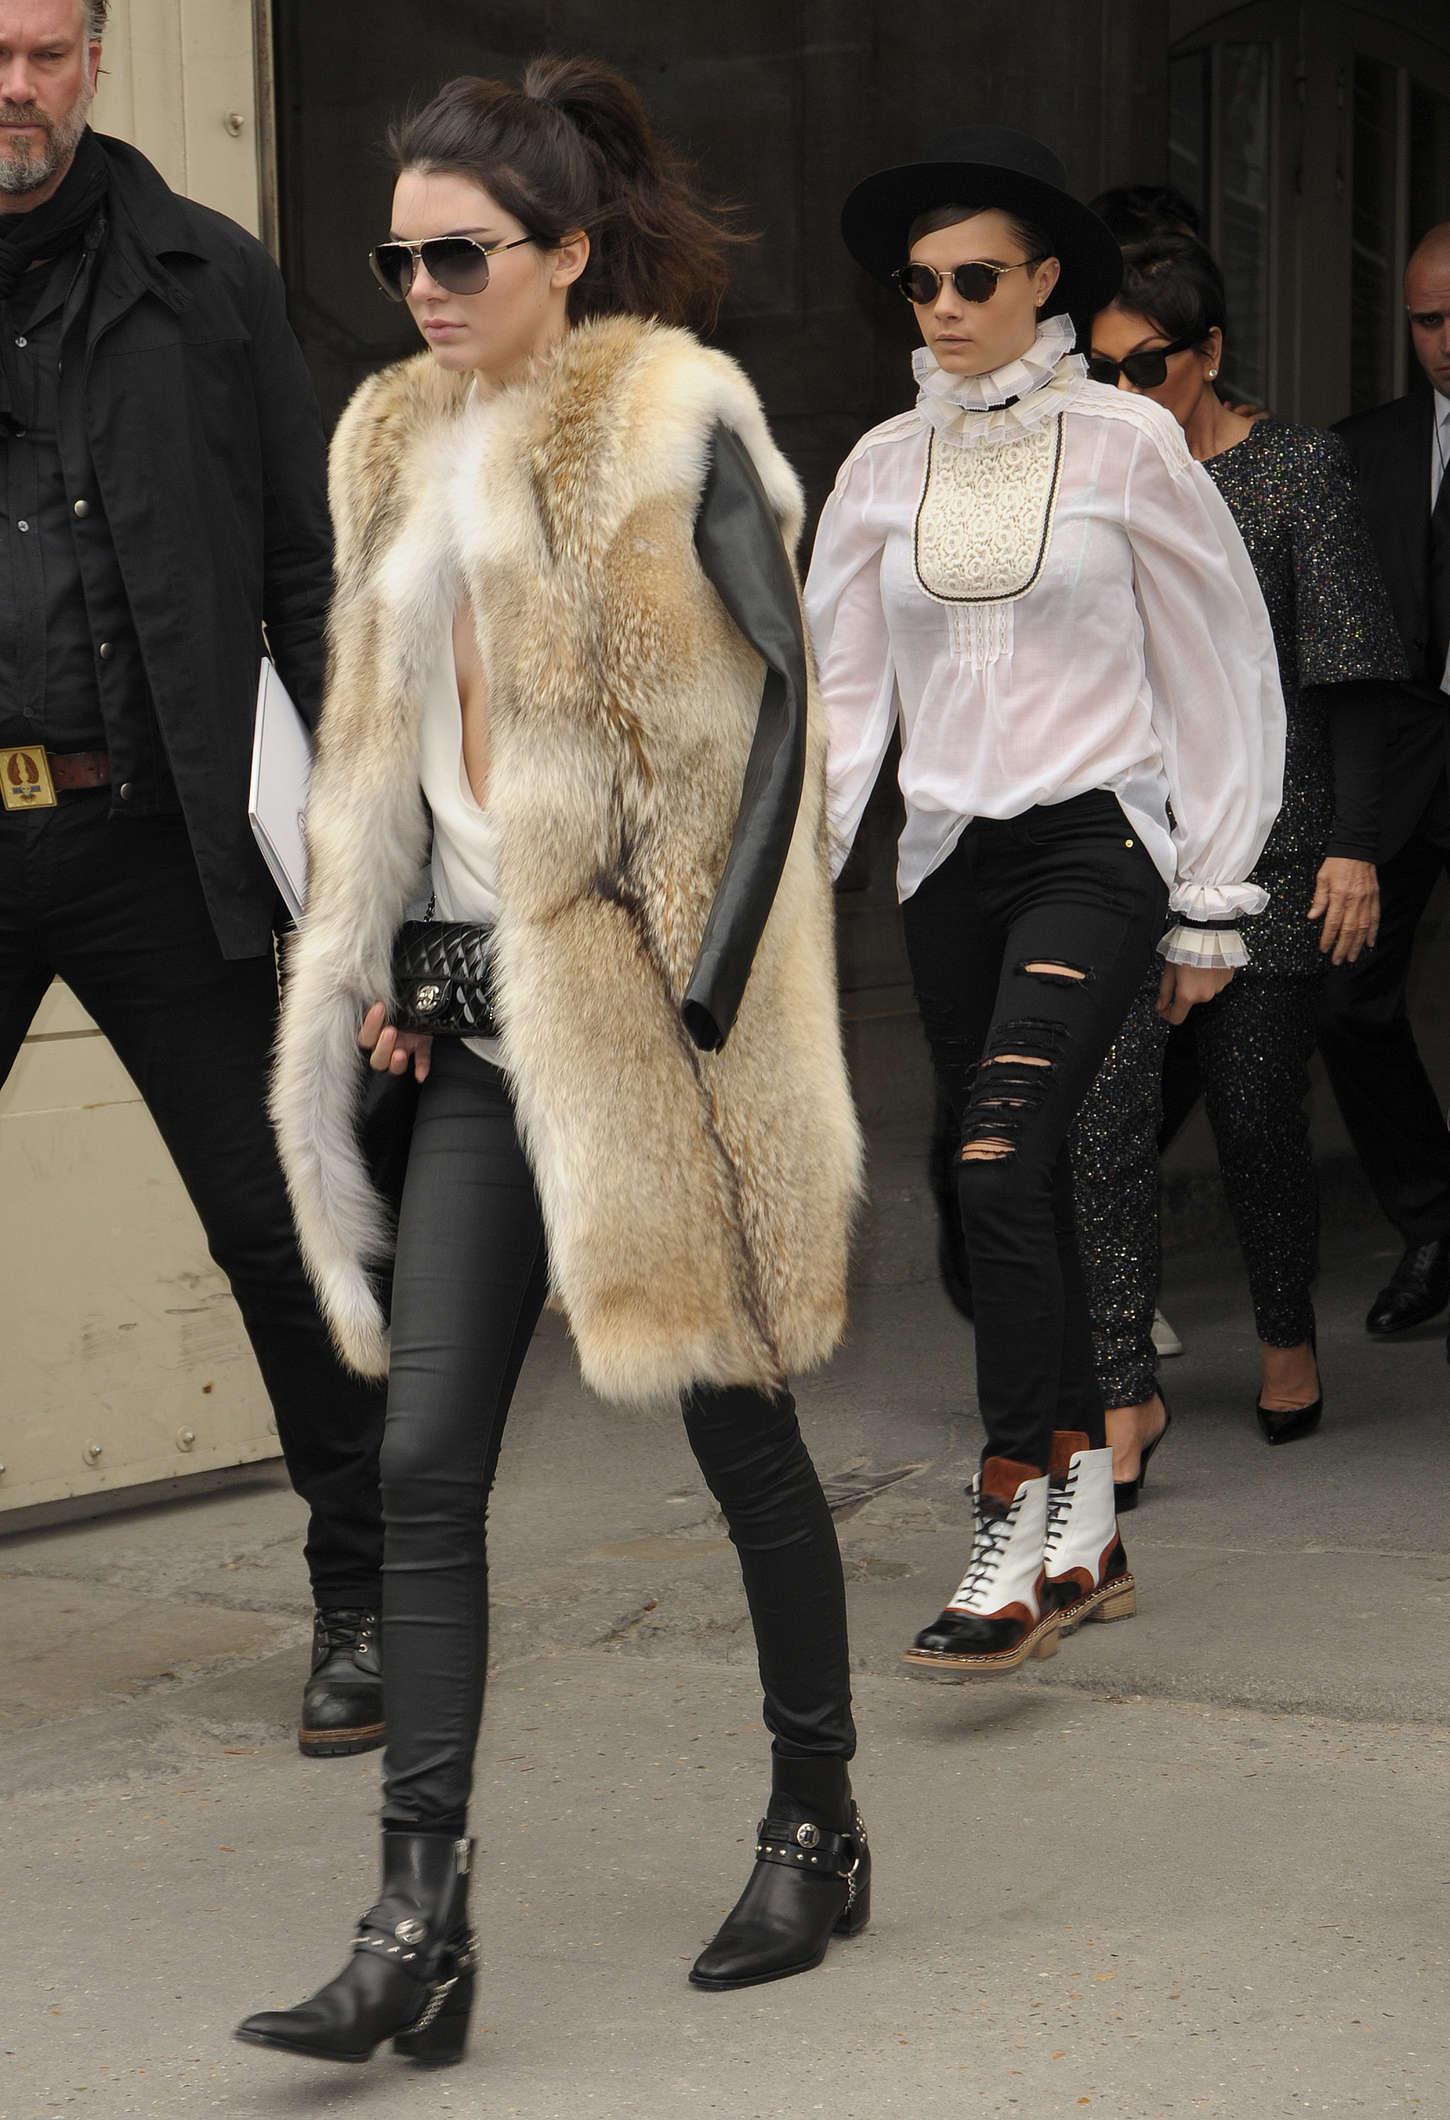 Kendall Jenner 2015 : Kendall Jenner in Fur Coat -17